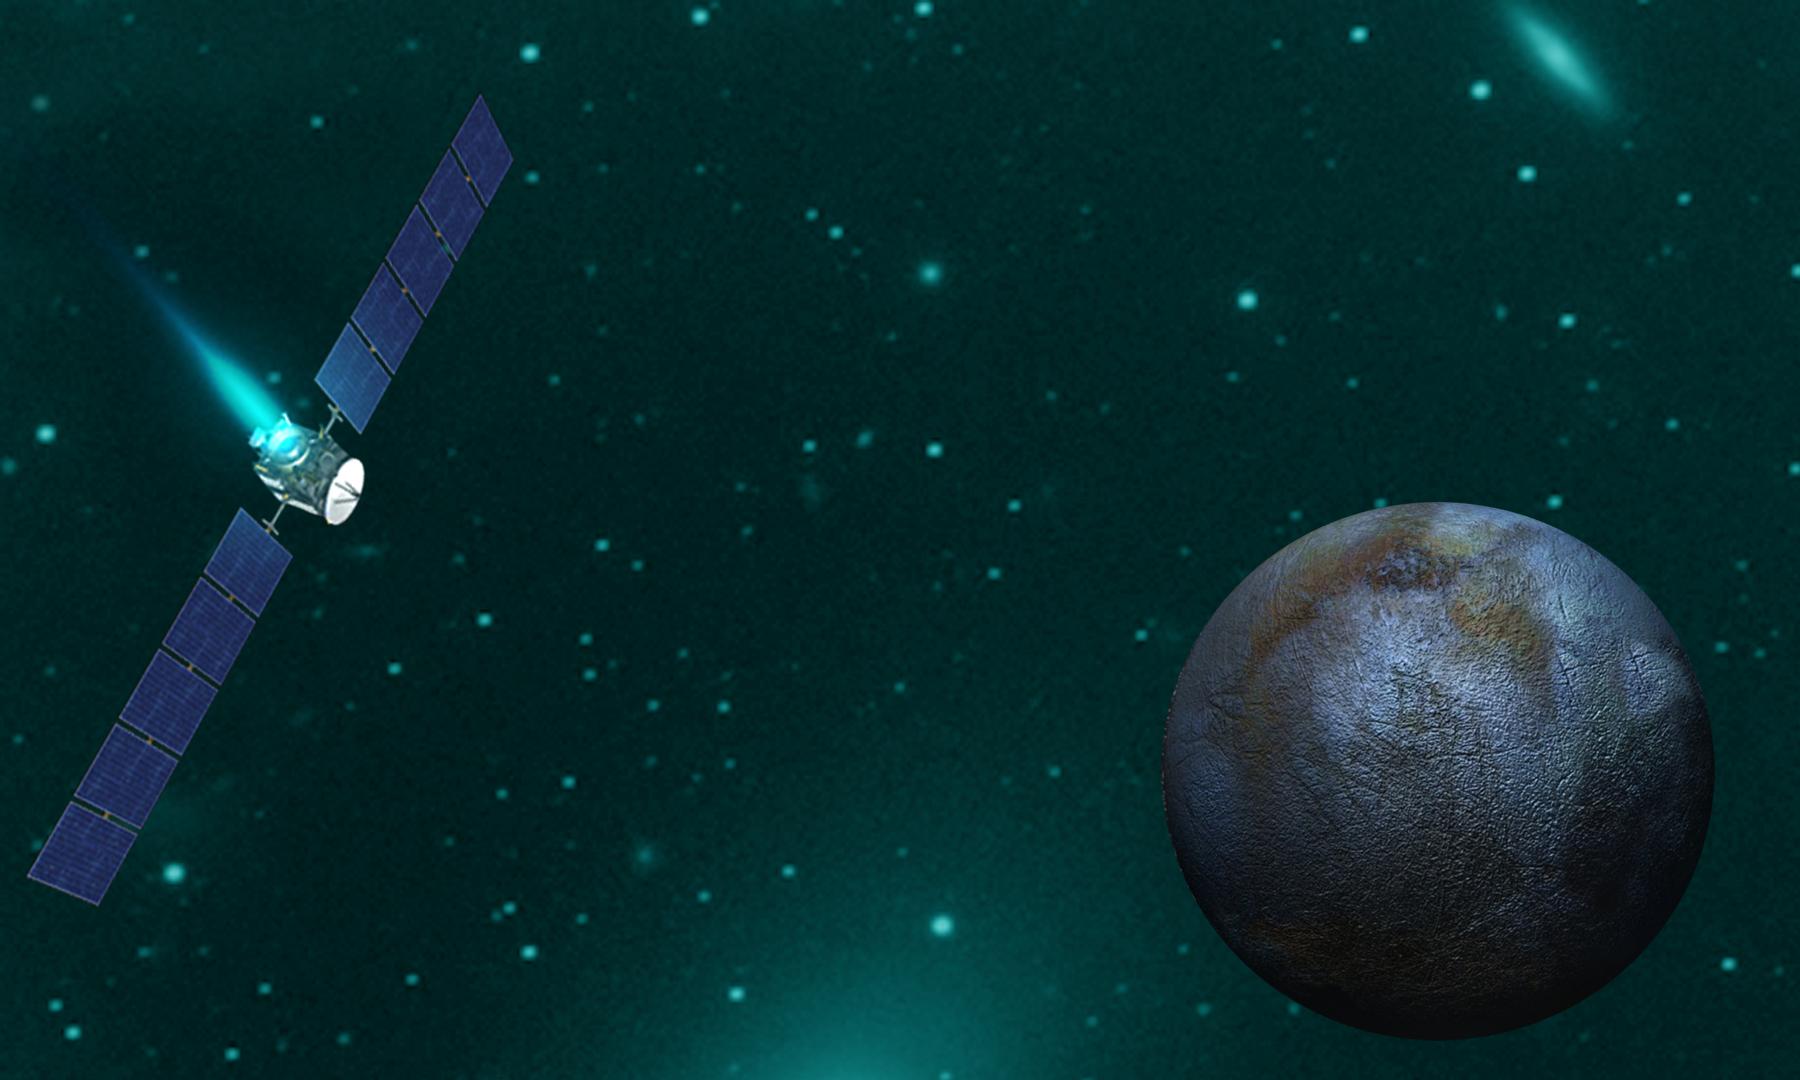 nasa dawn spacecraft diagram - photo #20